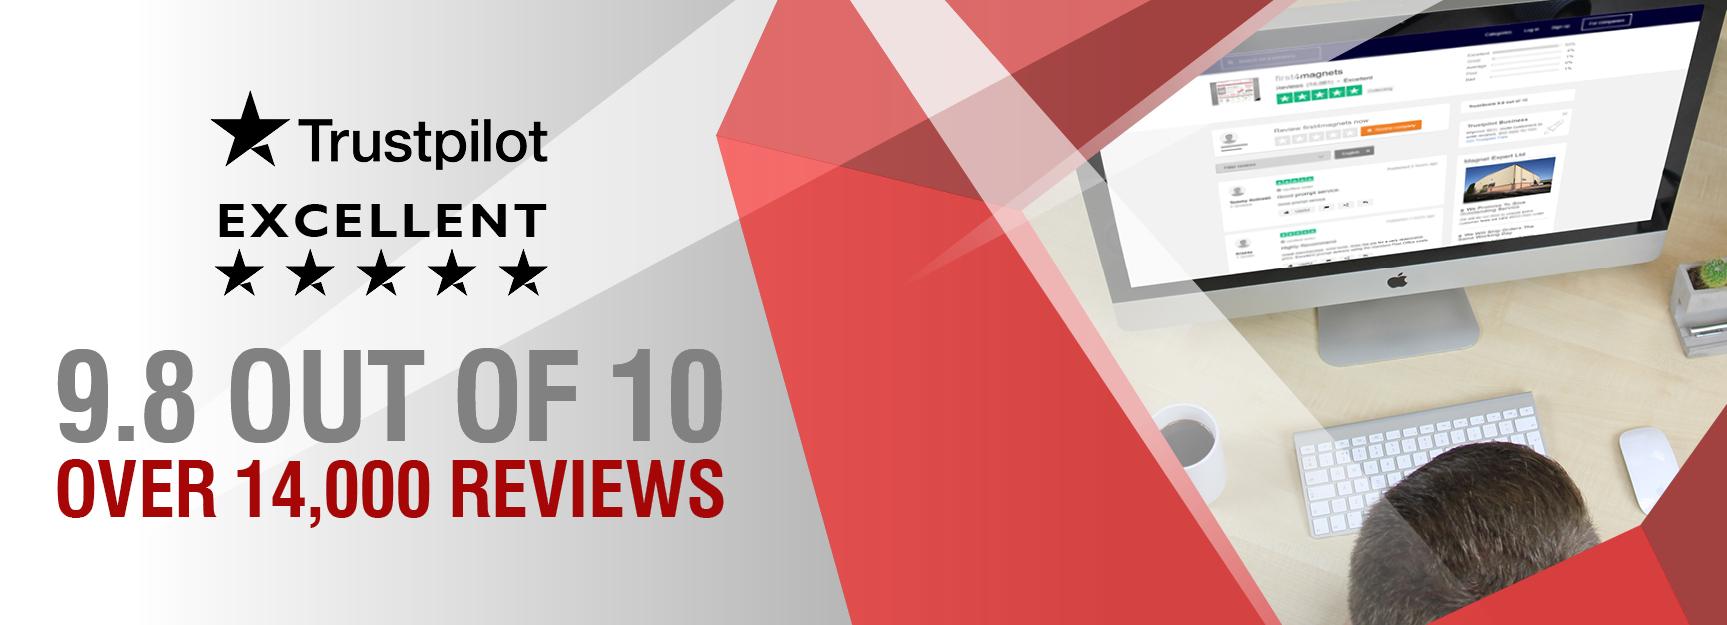 Trustpilot 14,000 Reviews